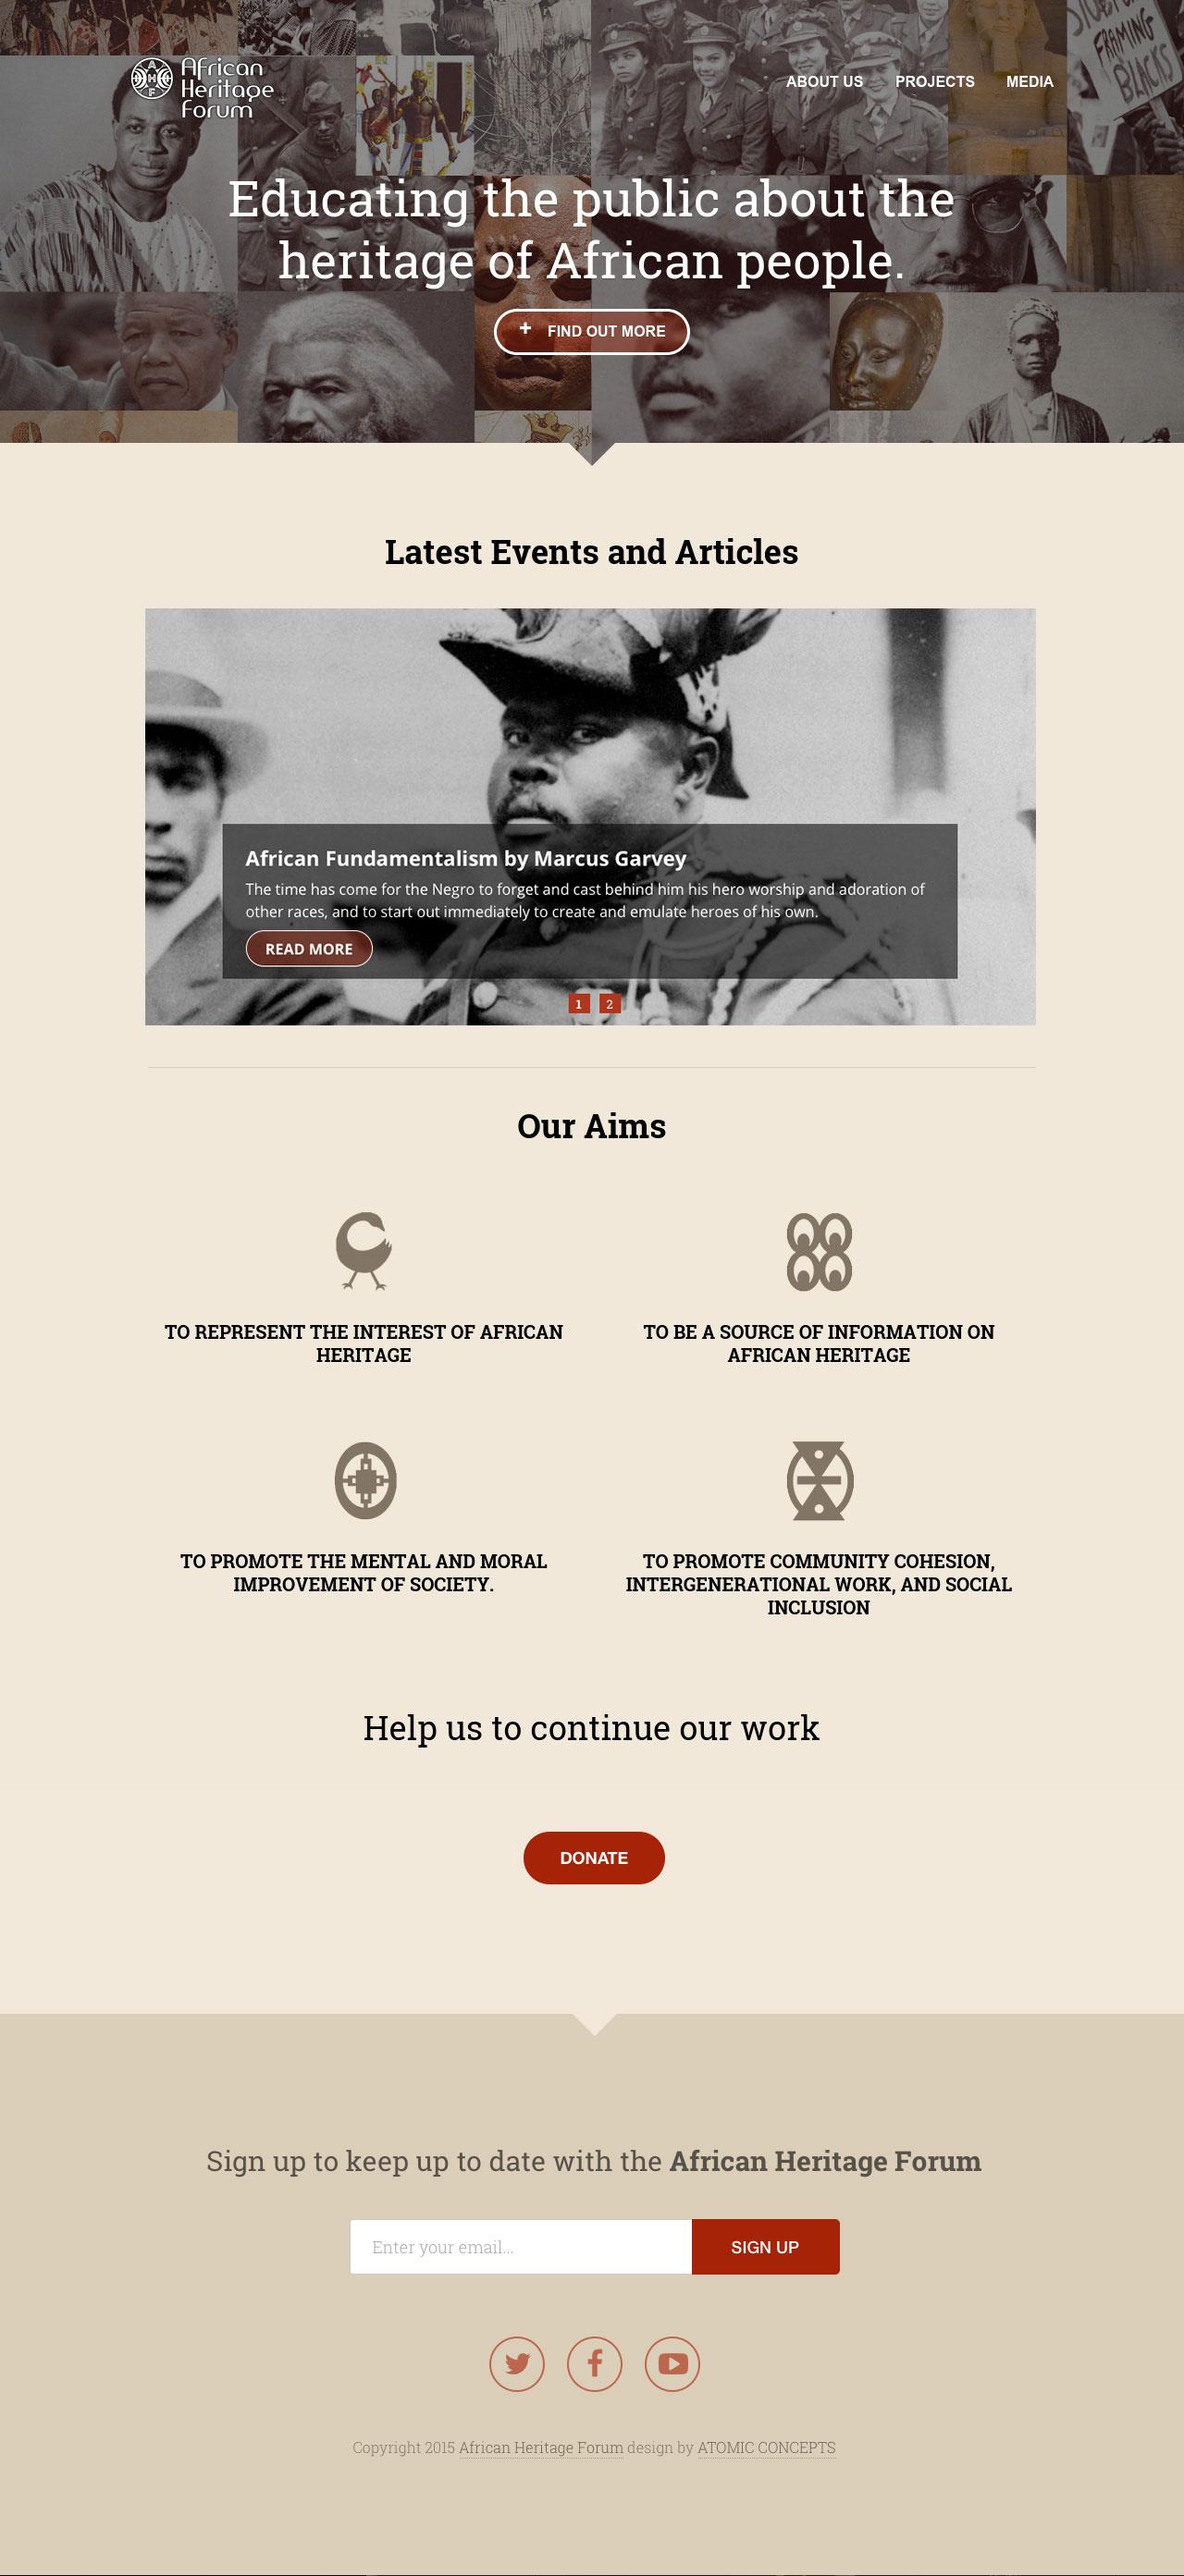 afrivan-heritage-forum-web-1